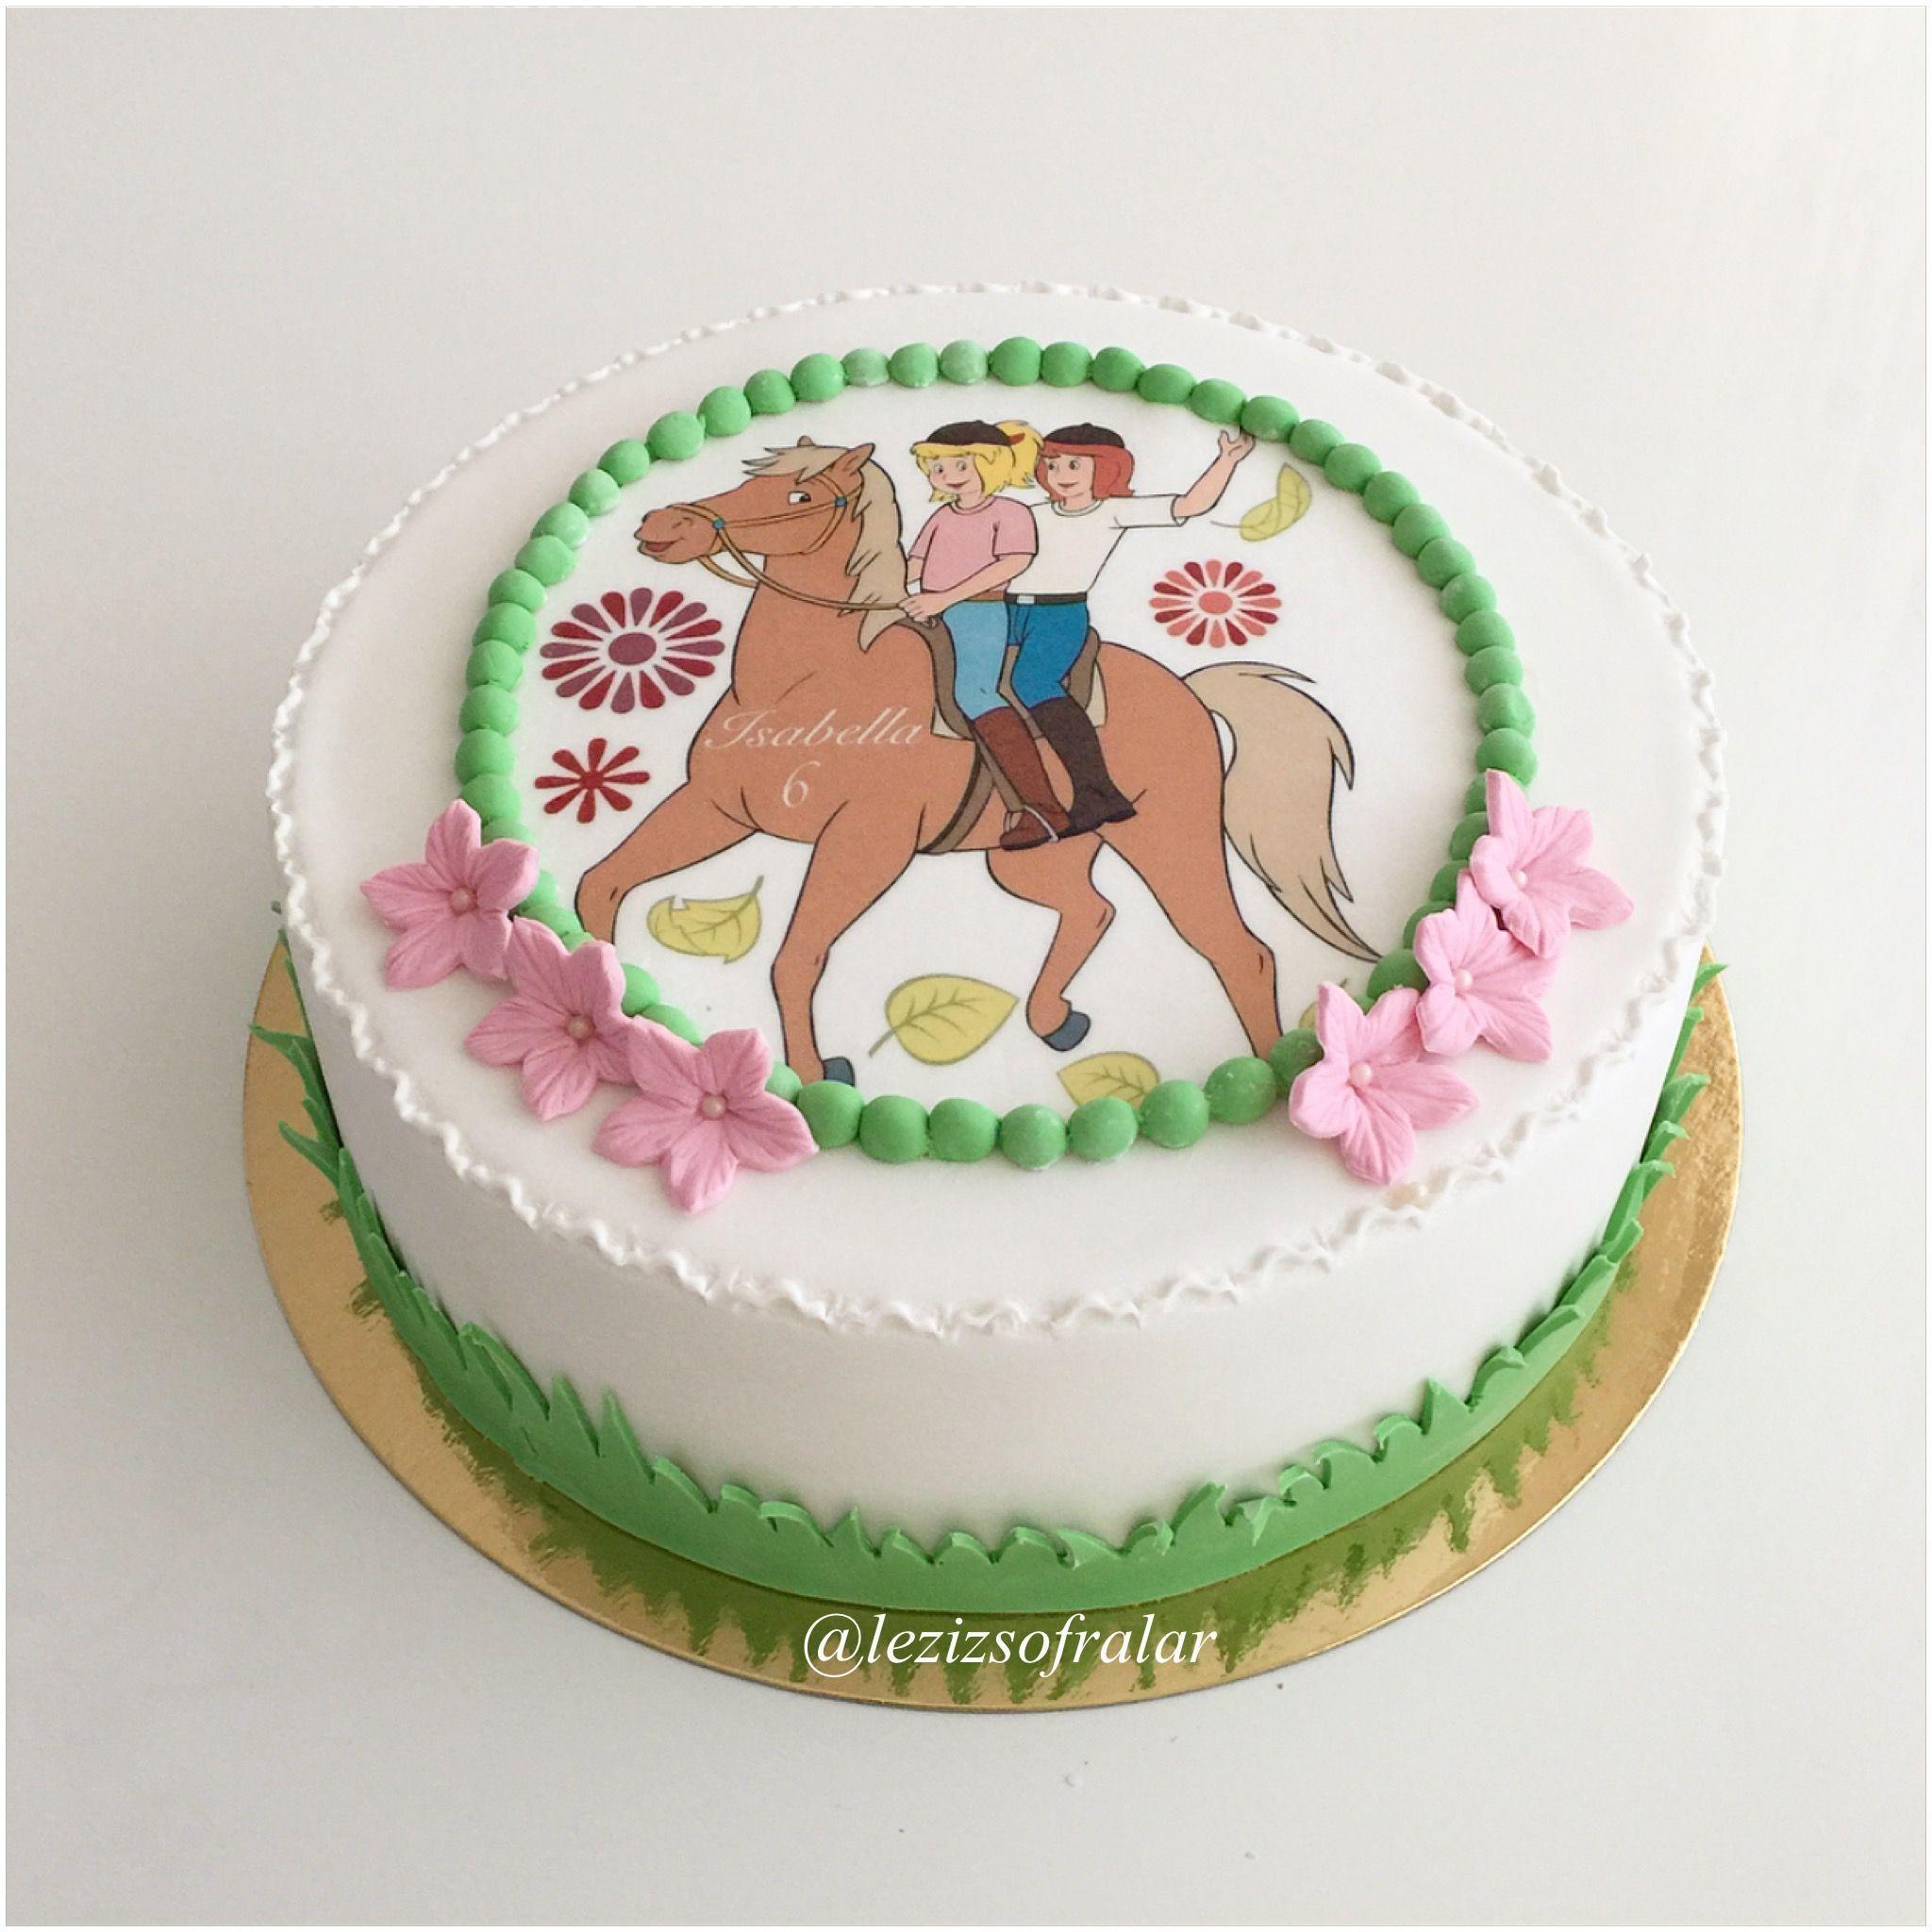 Bibi Tina Pastasi Bibi Und Tina Torte Torte Kindergeburtstag Kindergeburtstag Essen Suss